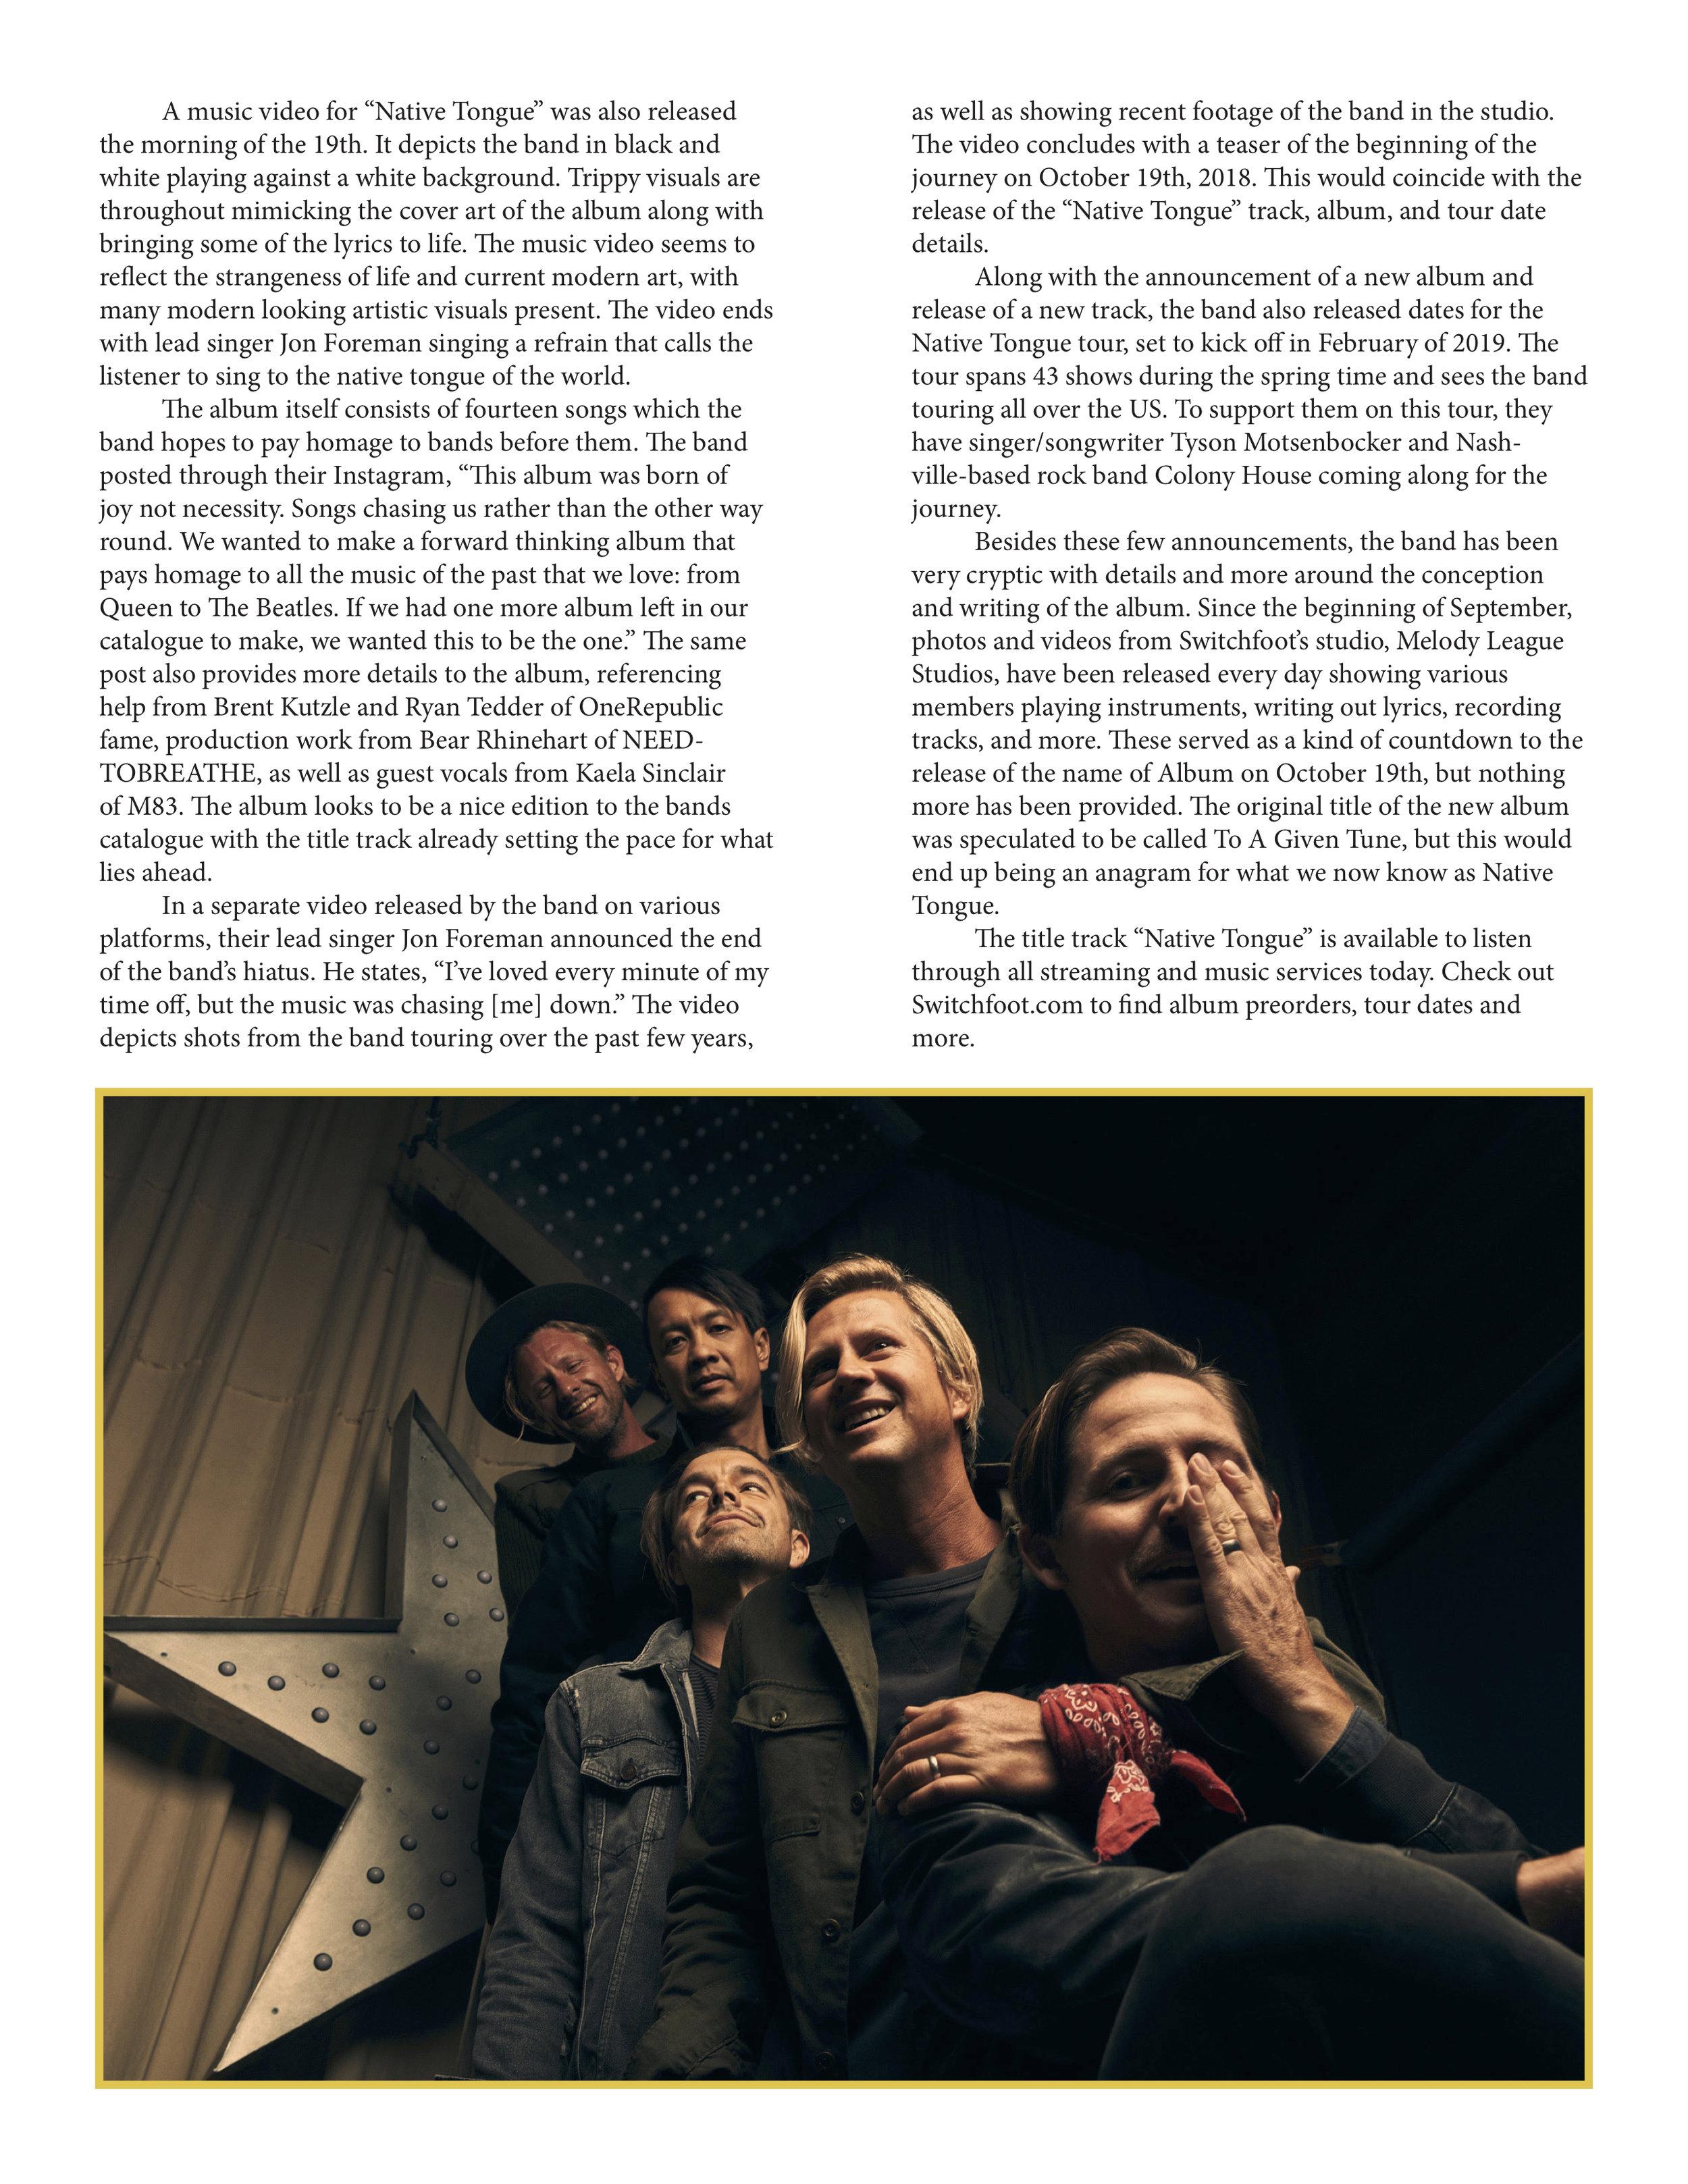 Switchfoot Album 11 Spread_v2(3).jpg